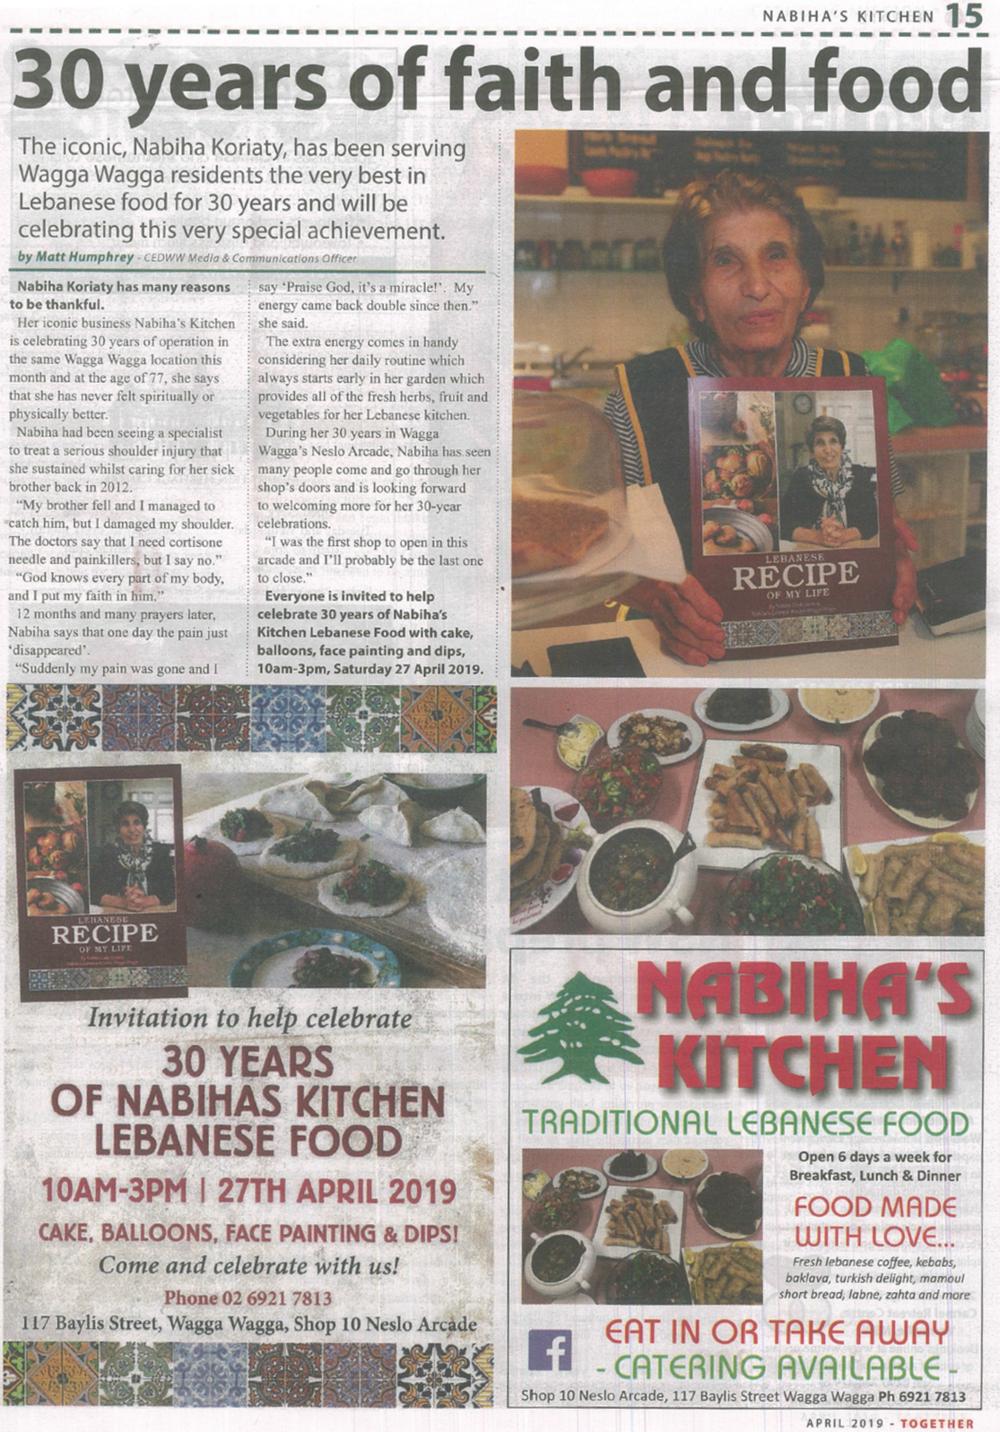 2019-04 Nabiha's Kitchen - Copy.png